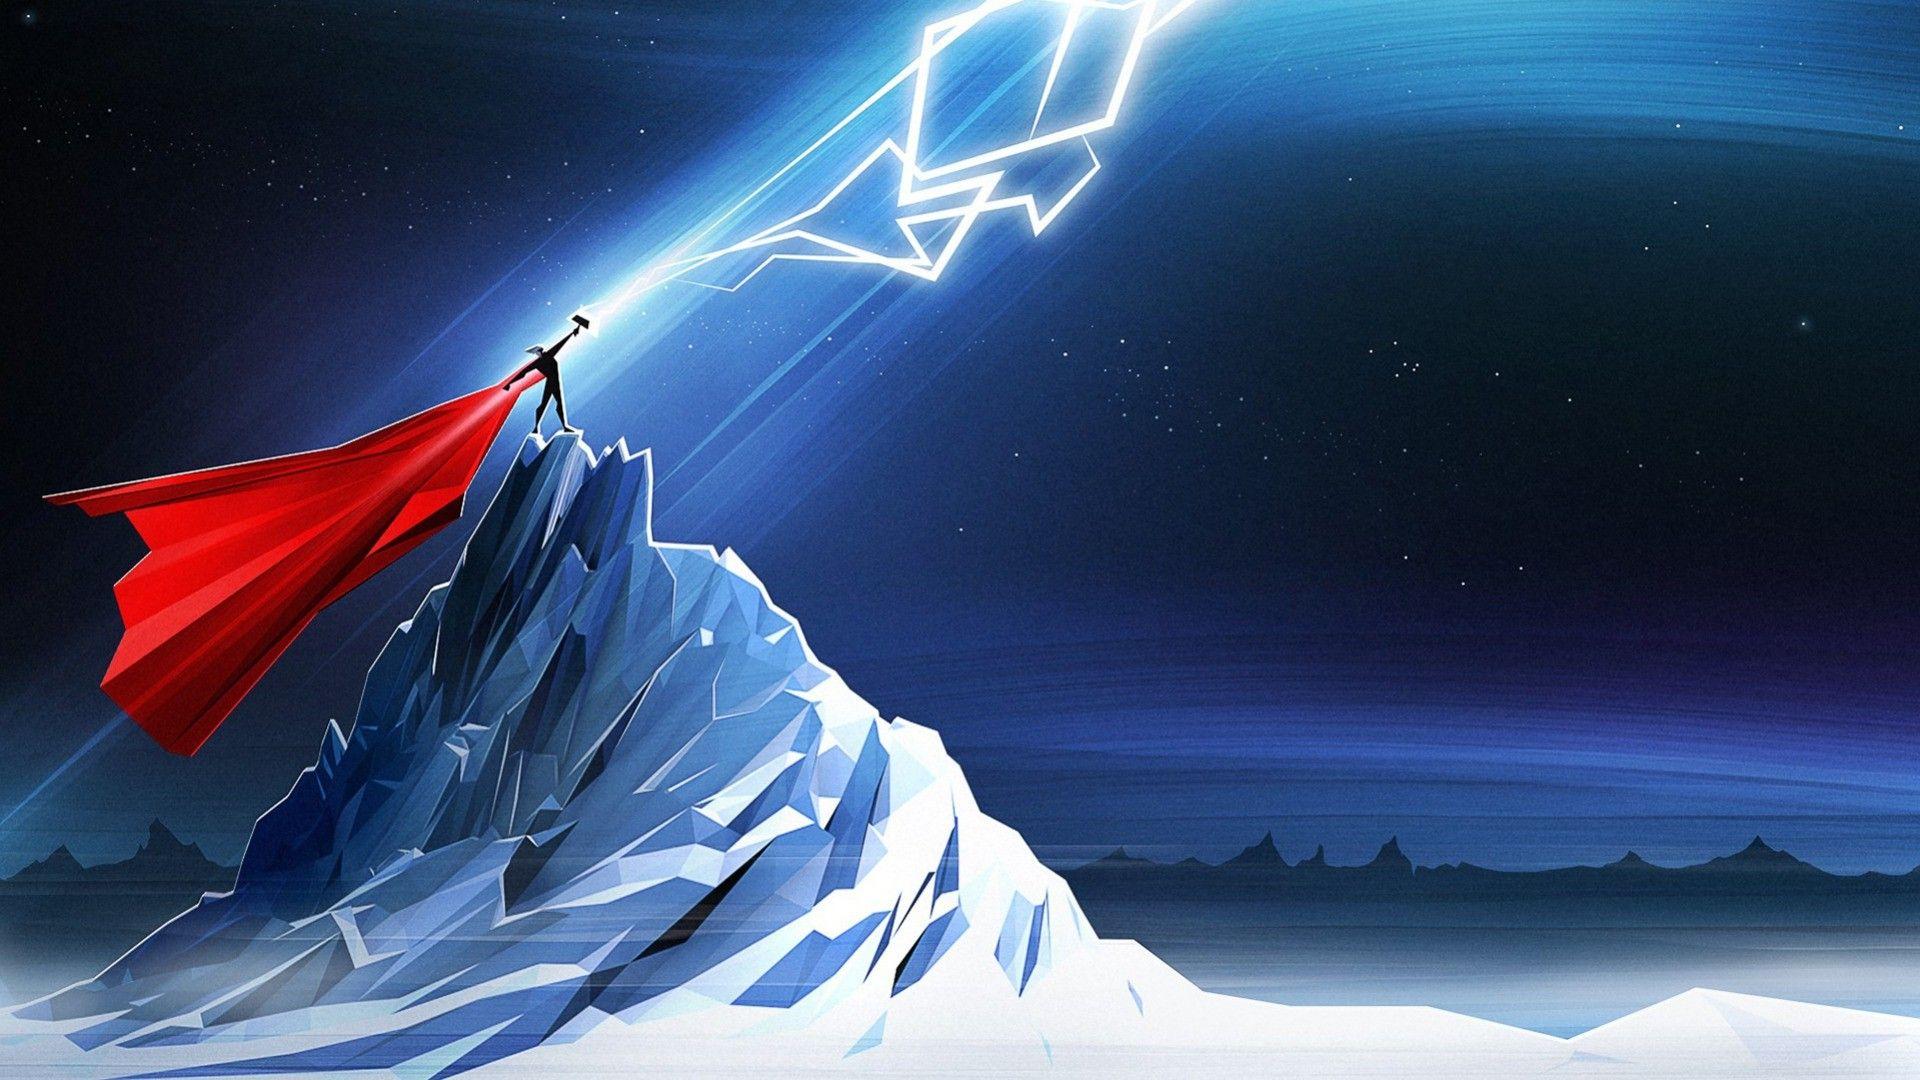 Thor Mjolnir Lightning Simple Marvel Comics Wallpapers Hd